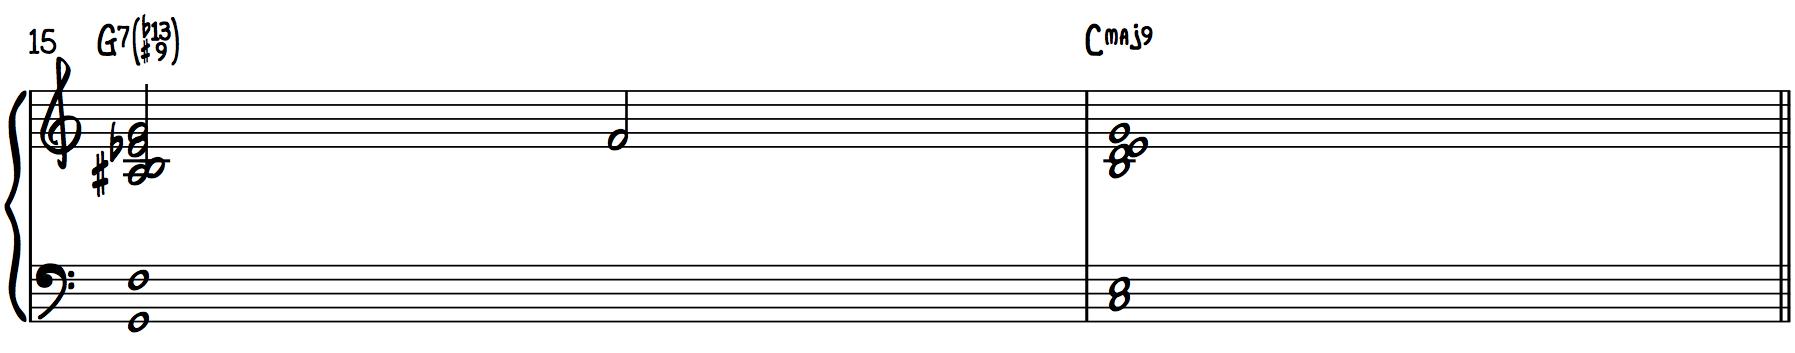 Bill Evans Chords (b13, #9 Chords) harmonize chord progression